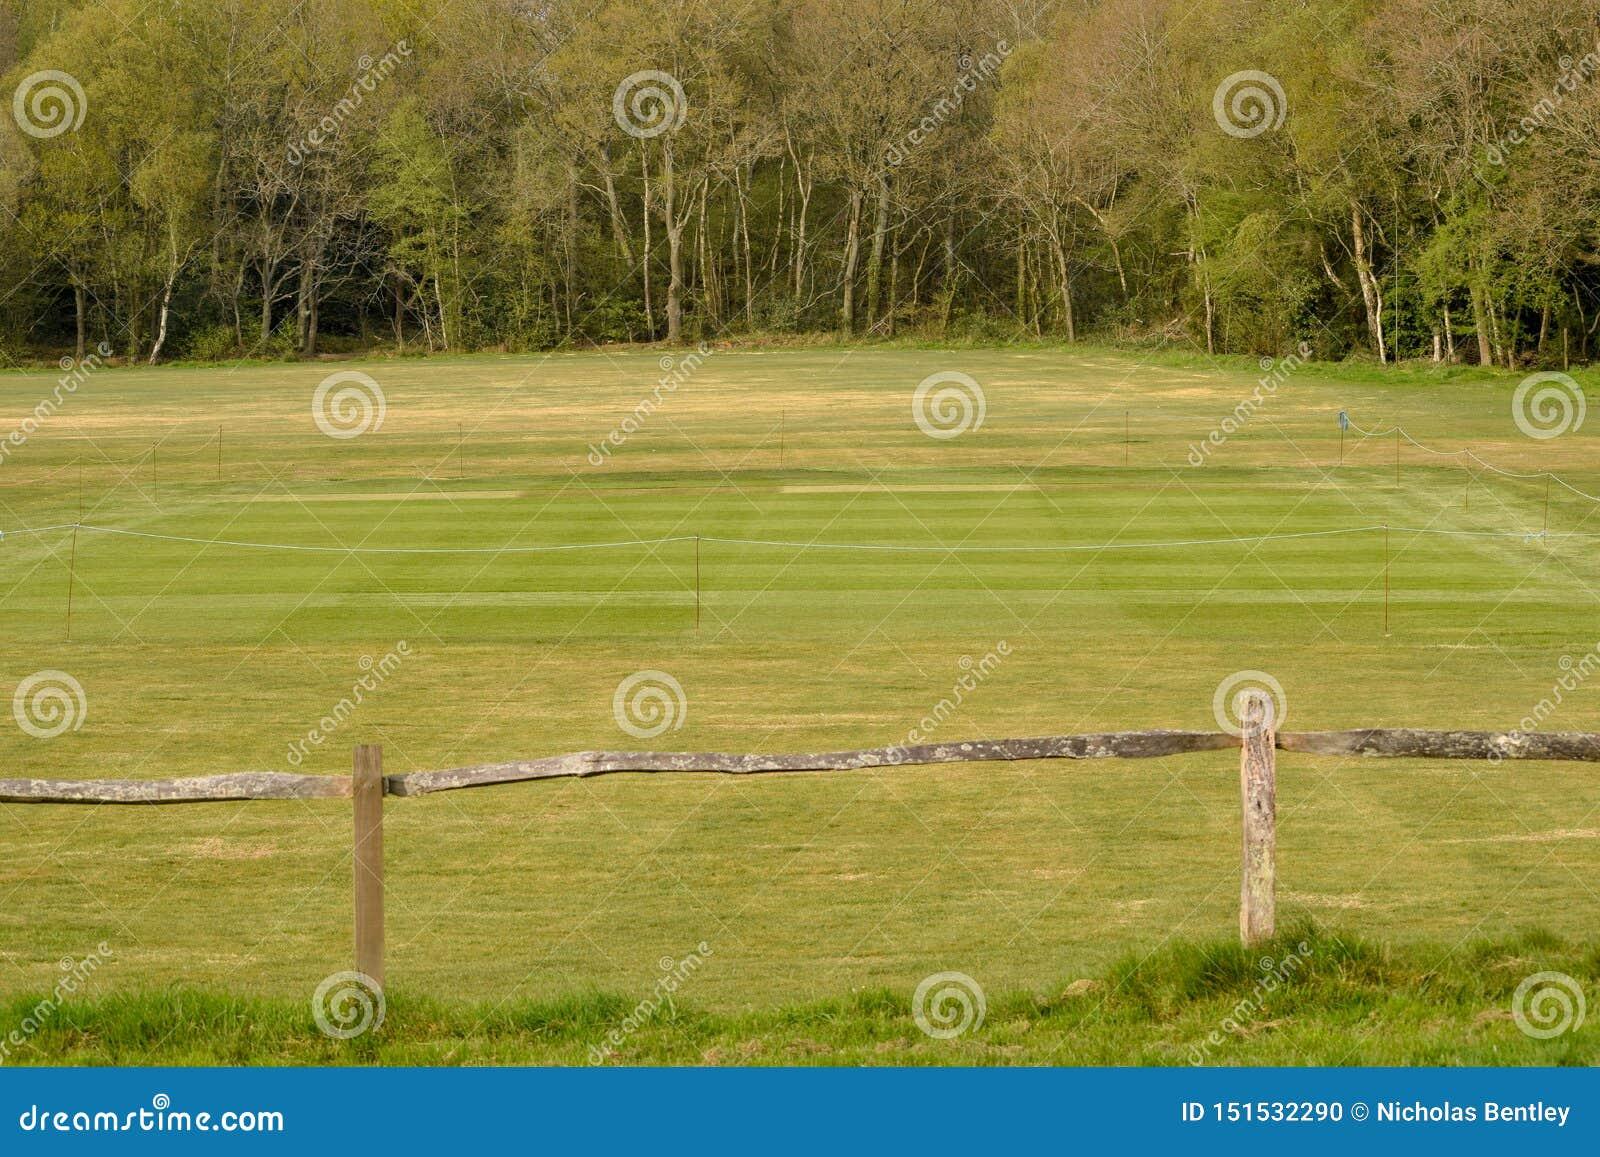 Village Cricket Green, Henfield Common